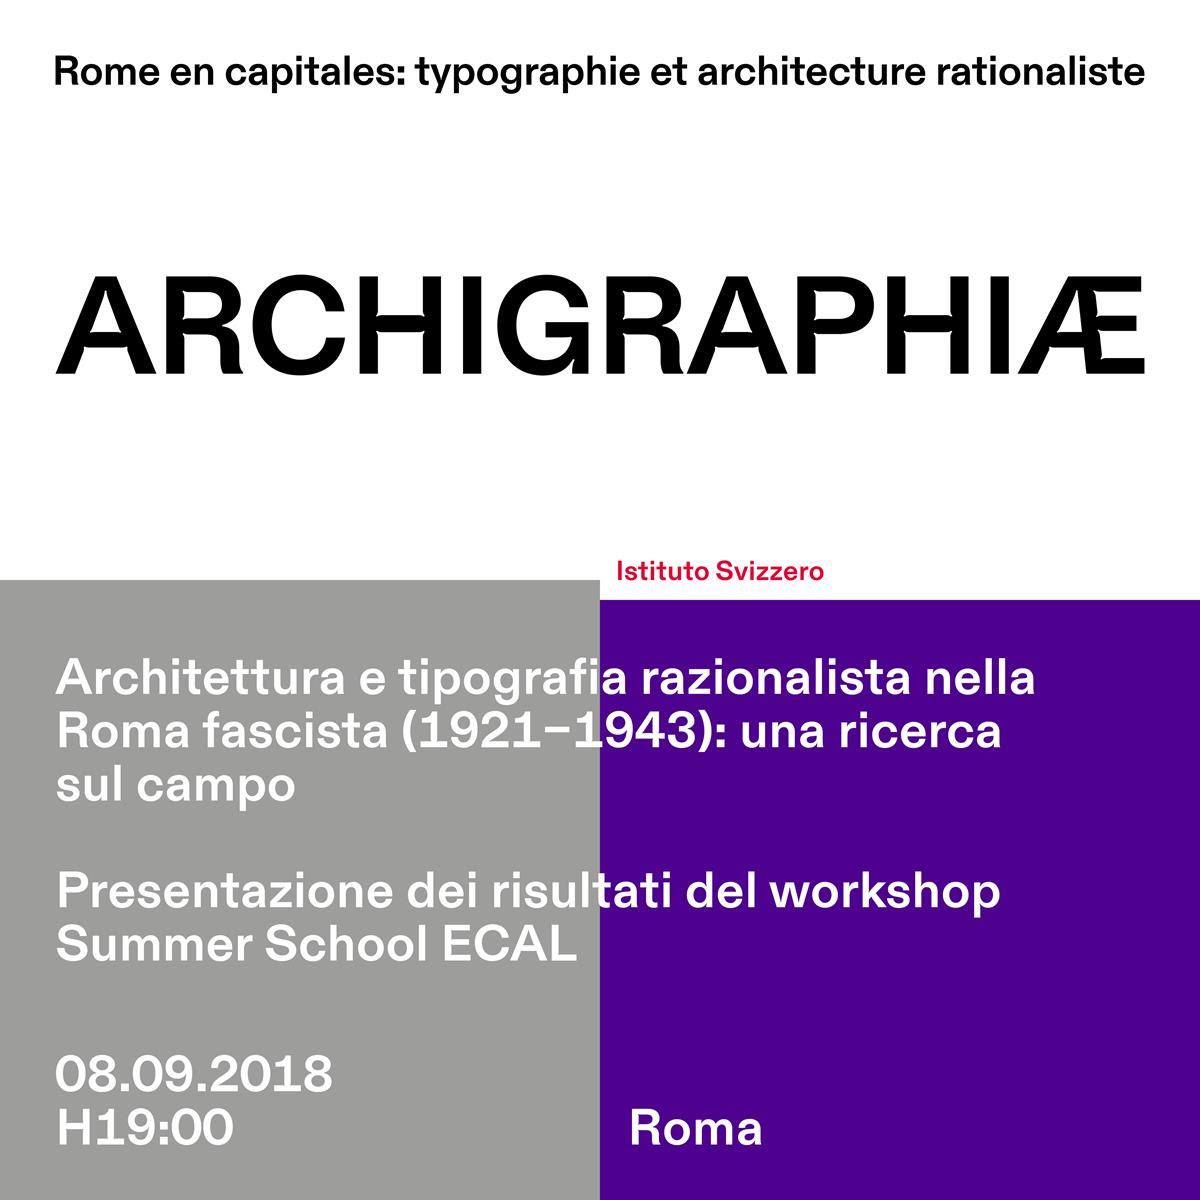 Archigraphiæ